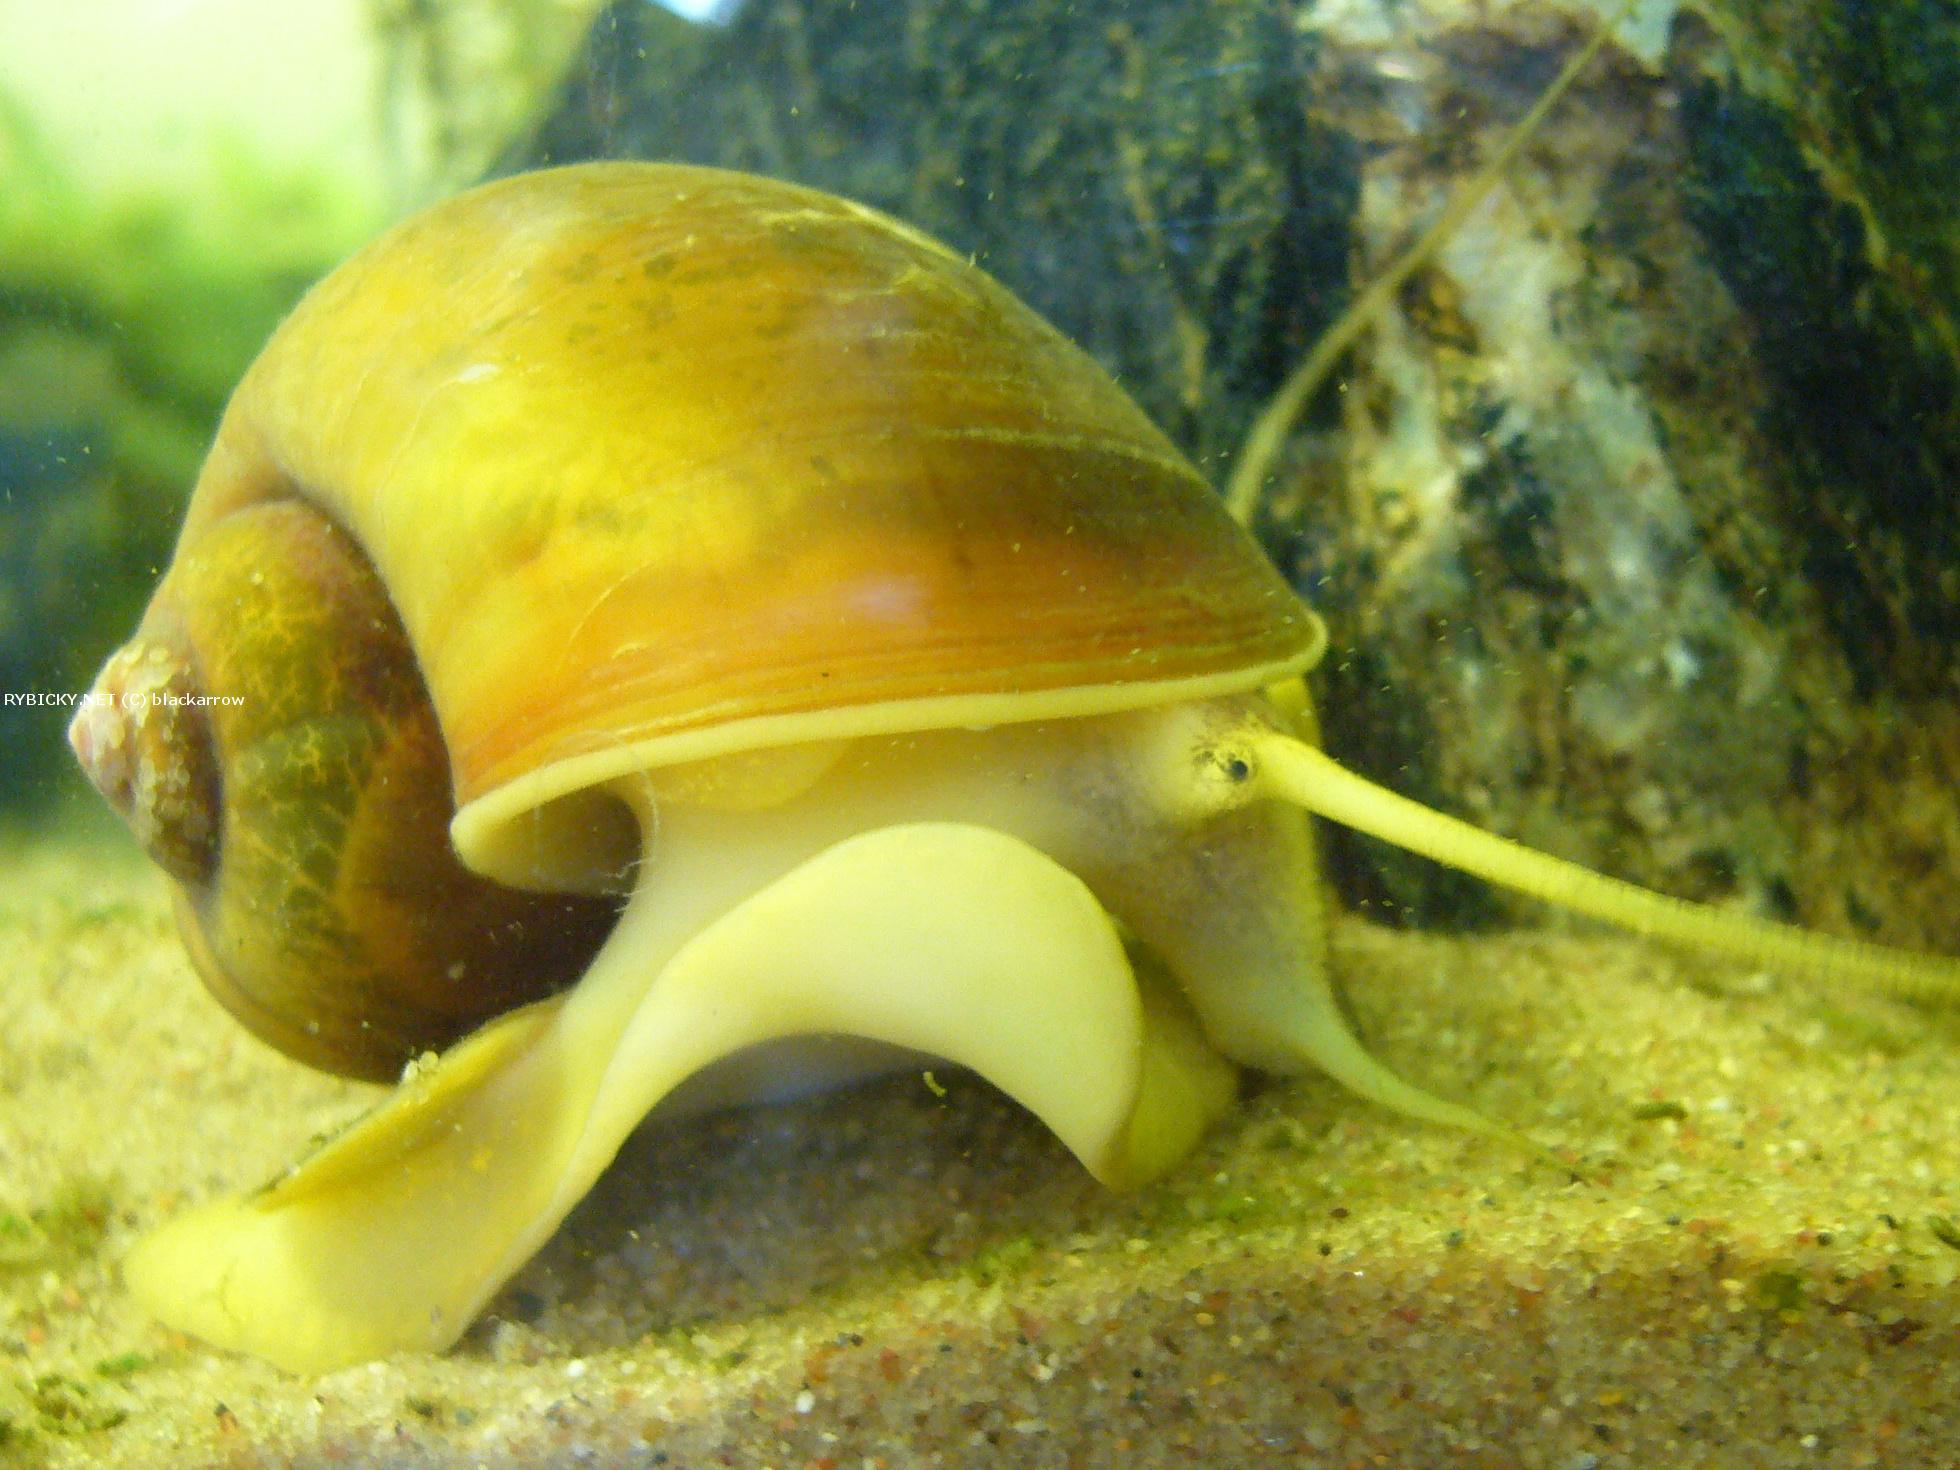 Pomacea Canalicuta: Facts, Characteristics, Habitat and More